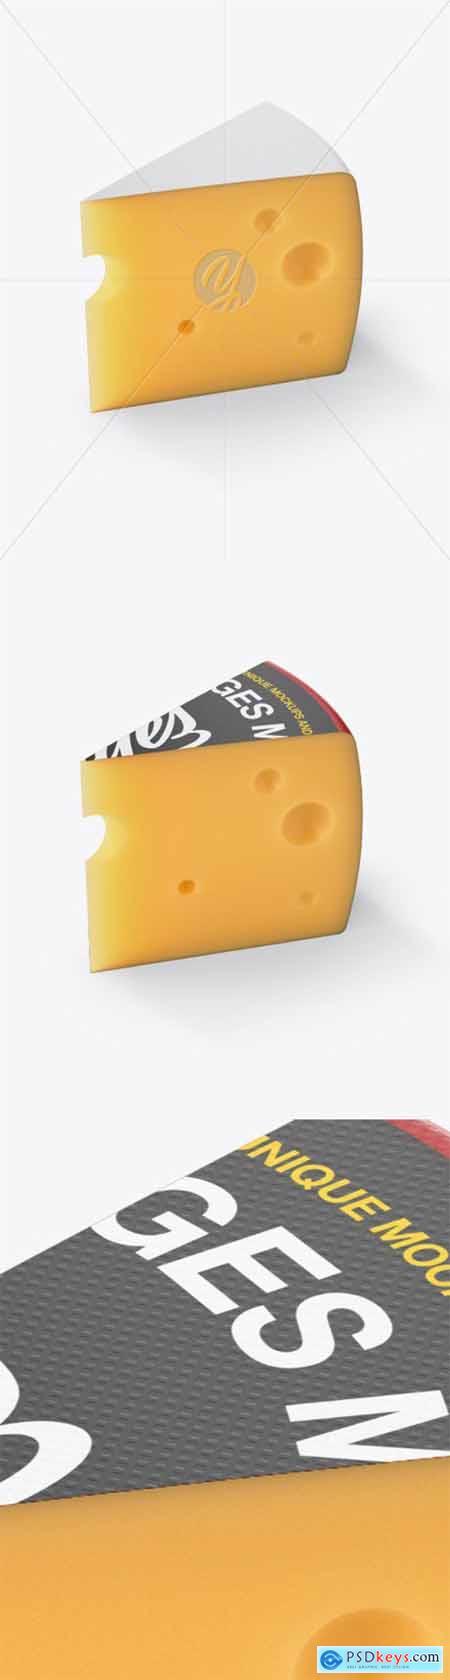 Piece of Cheese Wheel Mockup 51534